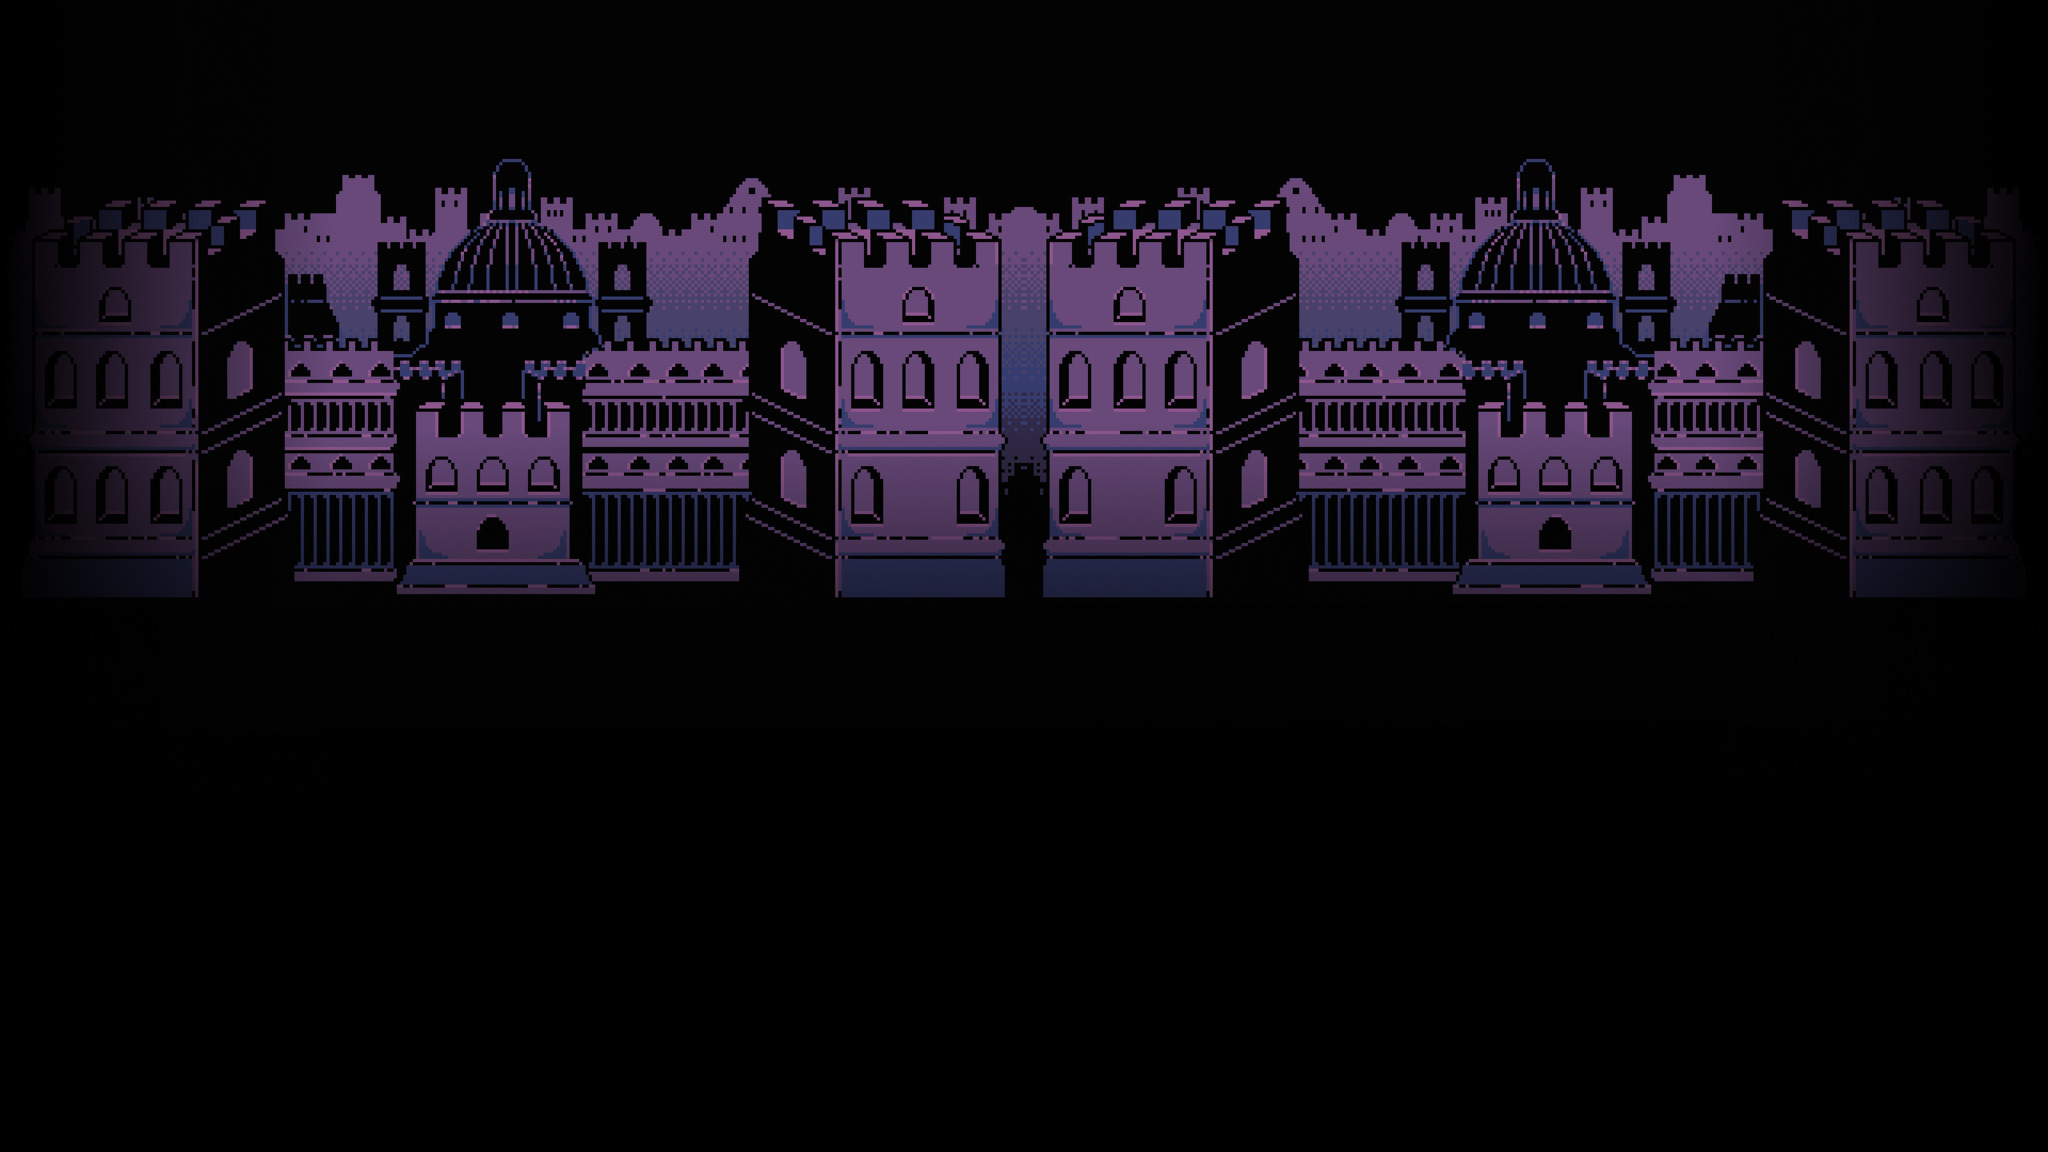 3d Wallpaper 800x1280 2048x1152 Undertale Game 2048x1152 Resolution Hd 4k